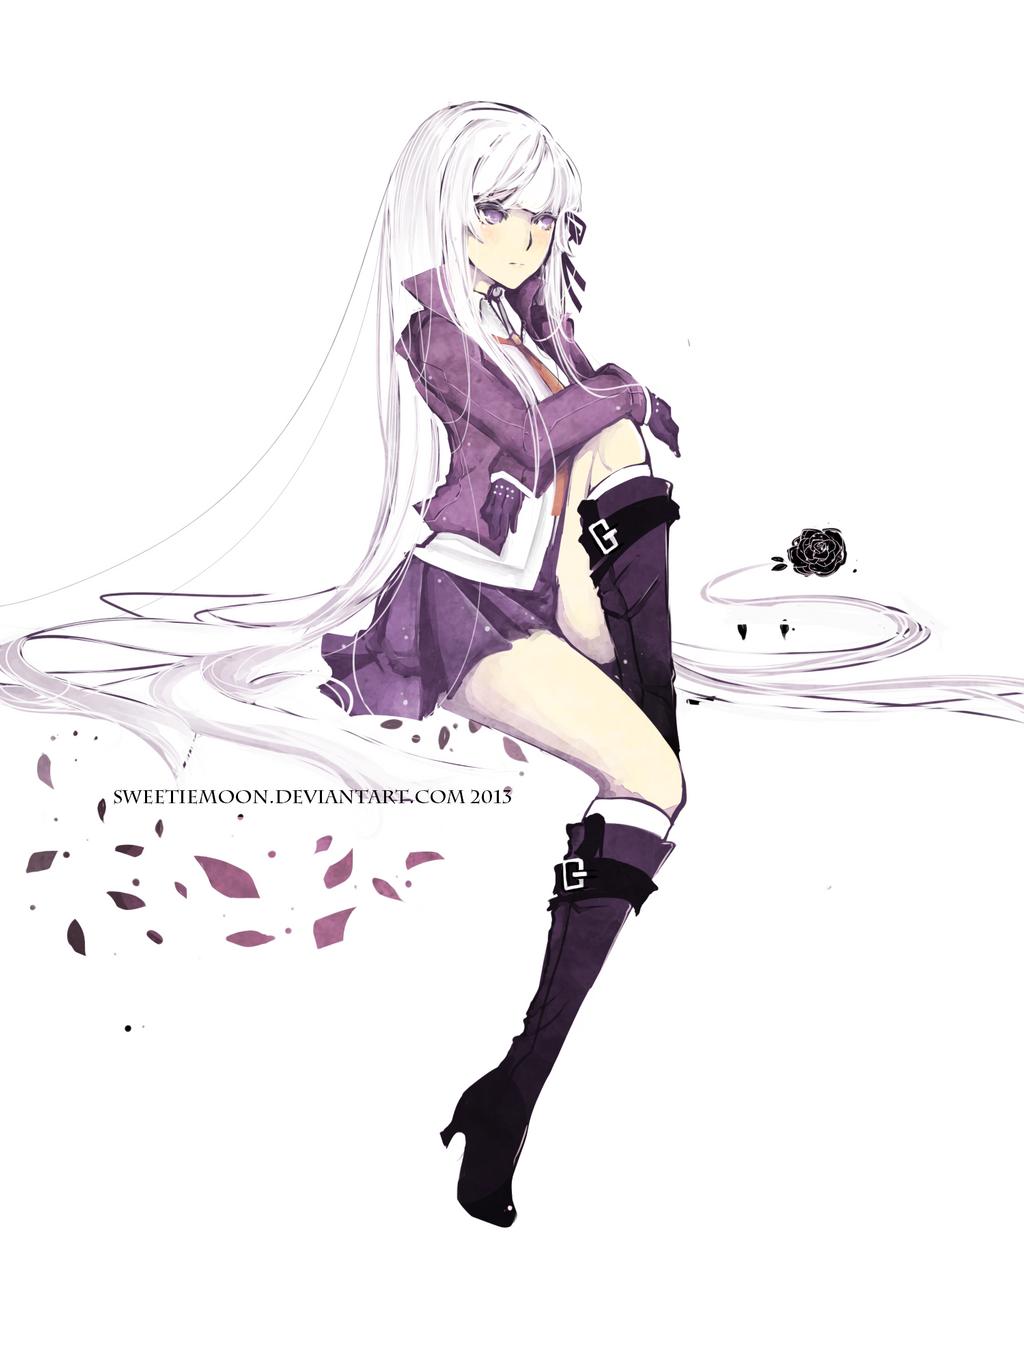 DanganRonpa: Kirigiri by SweetieMoon